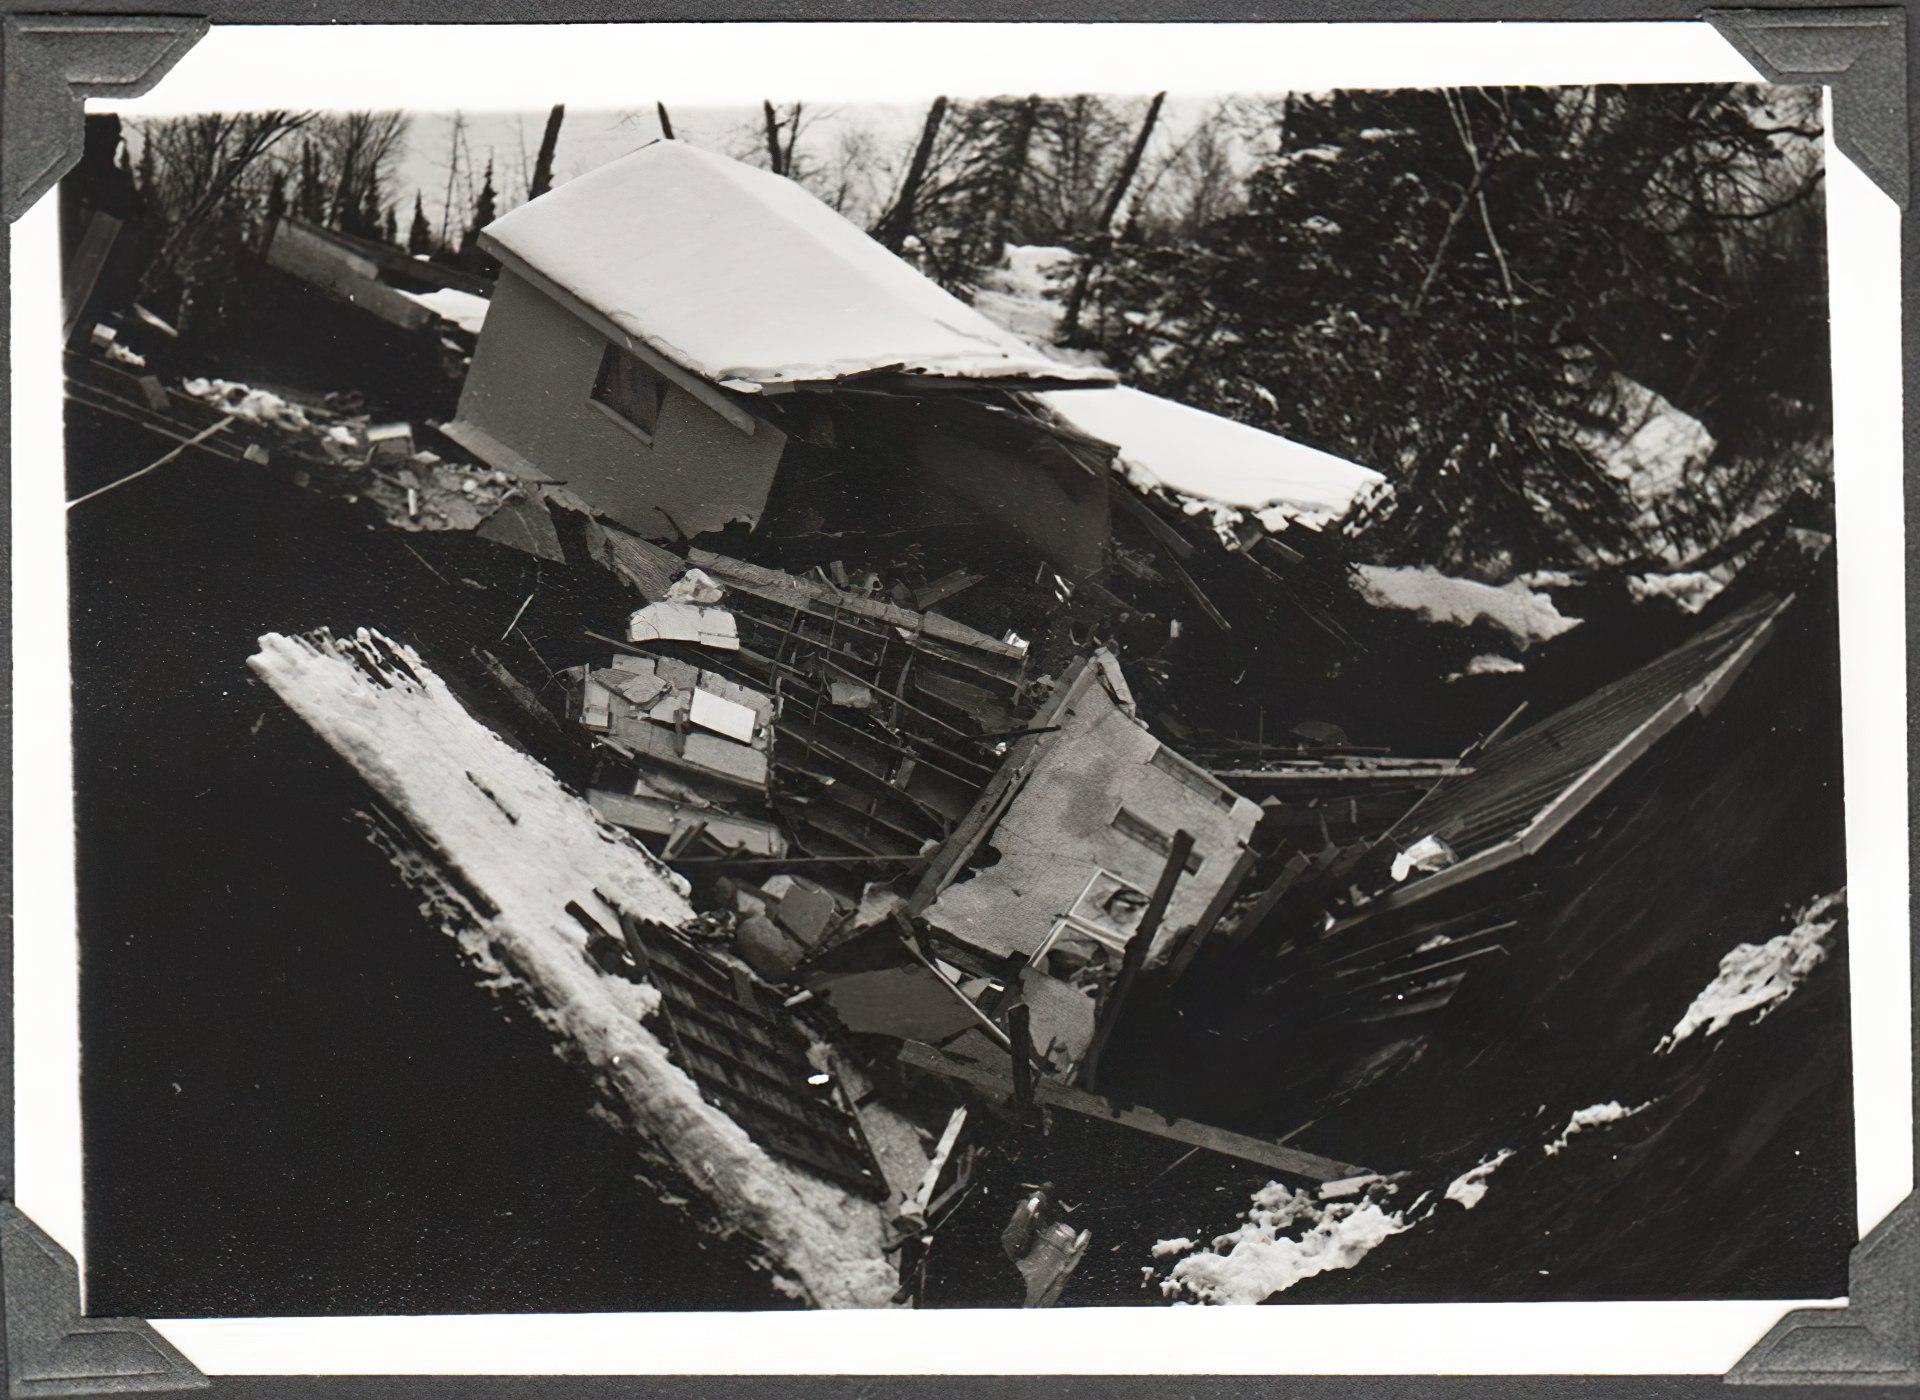 Anchorage 1964 earthquake damage